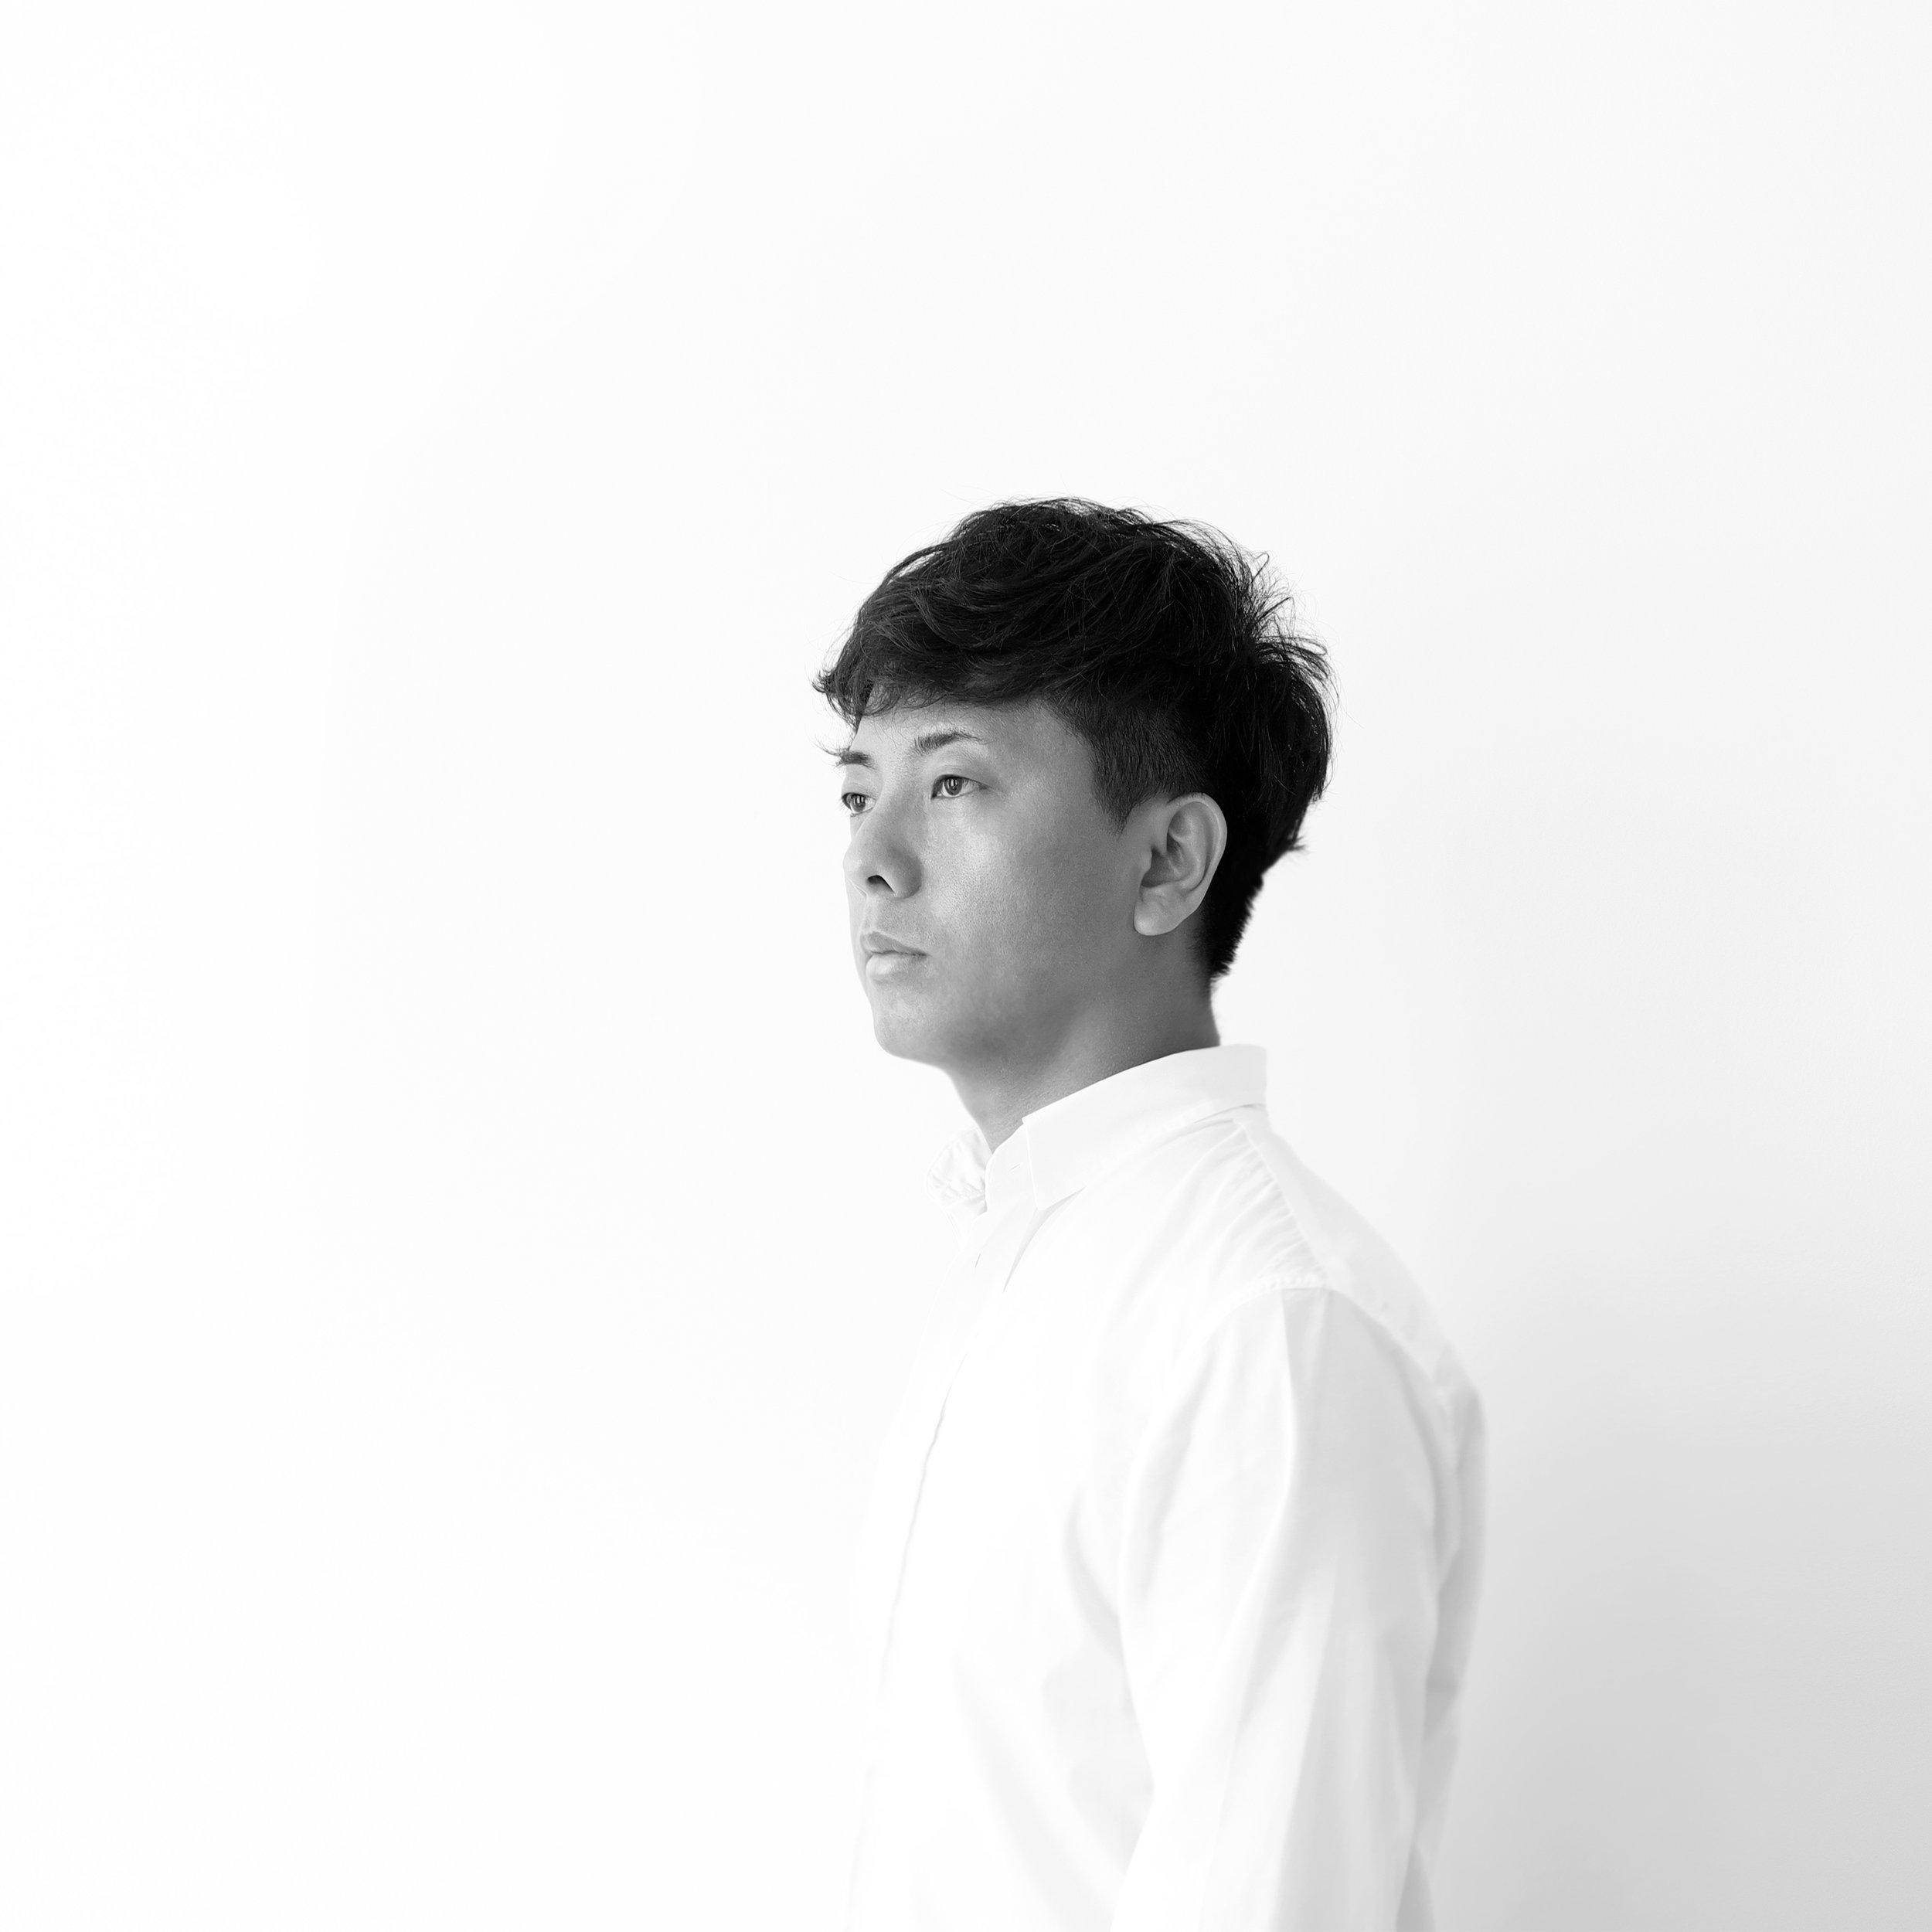 takimoto_portrait 2.jpg